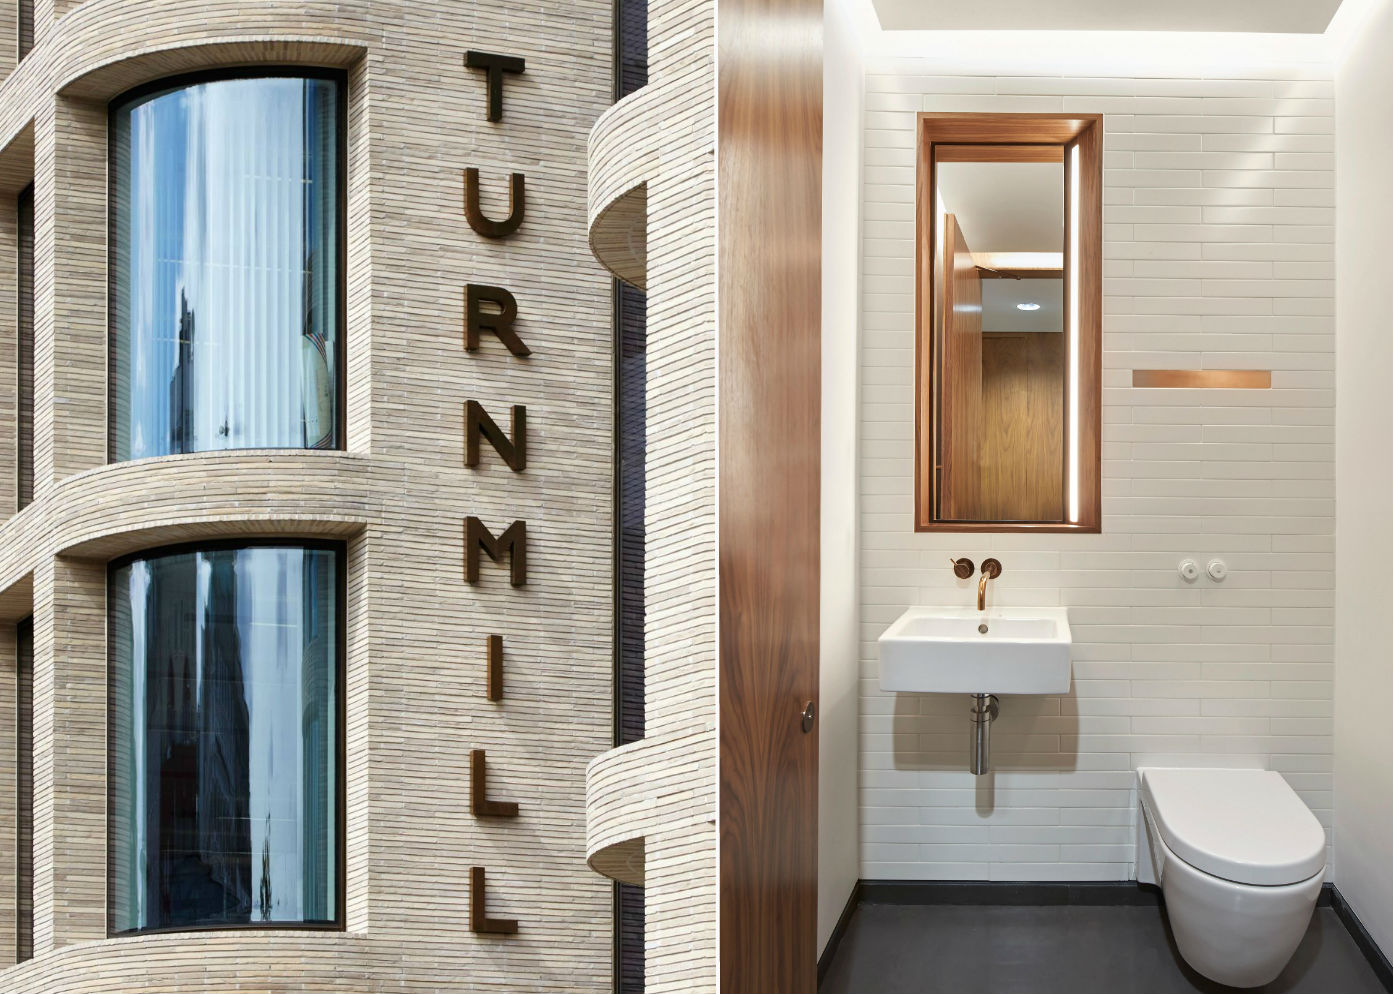 turnmill washrooms - Clerkenwell, London